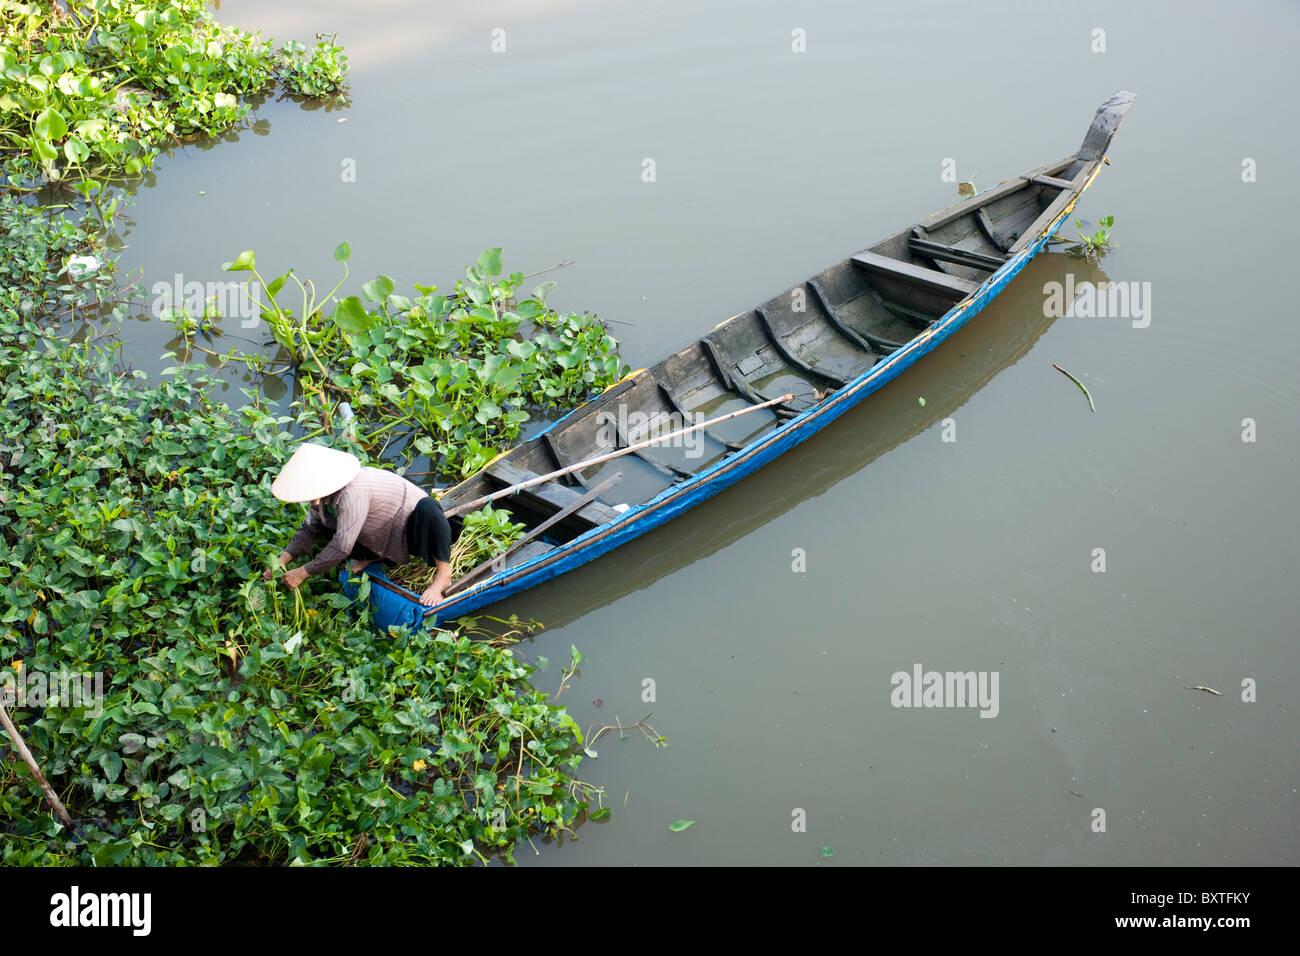 canoe, Mekong Delta, Chau Doc, Vietnam - Stock Image